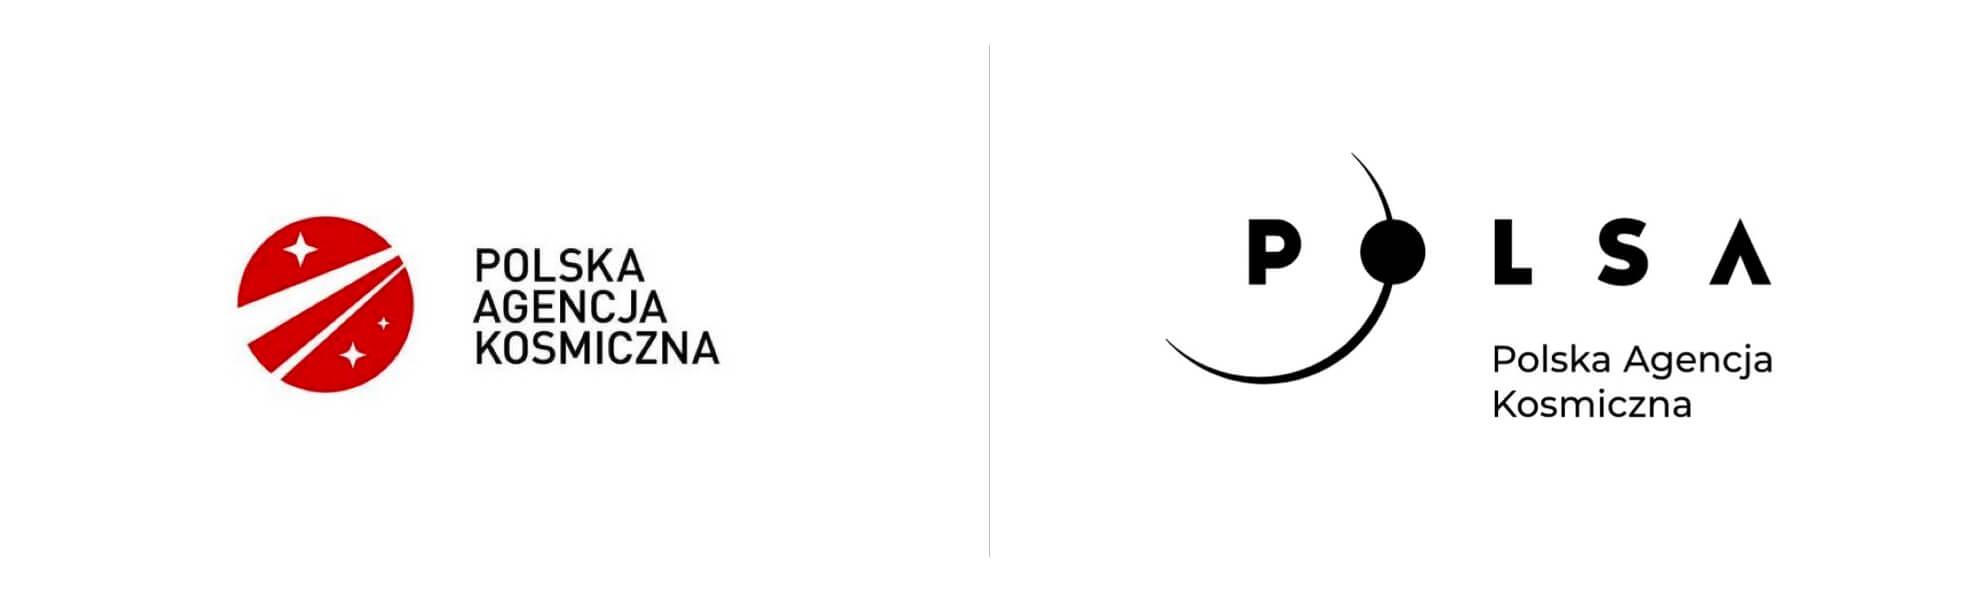 Stare inowe logo Polsa